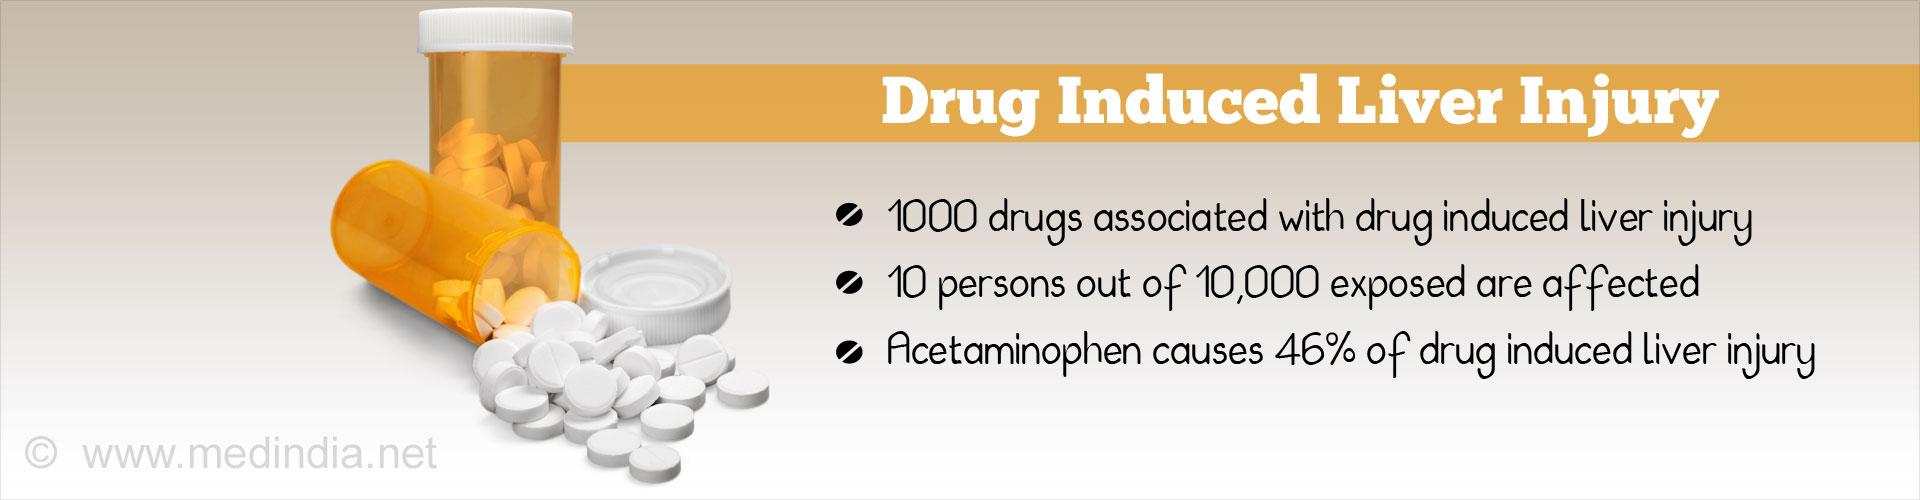 Acetaminophen Causes 46% of Drug-Induced Liver Injury